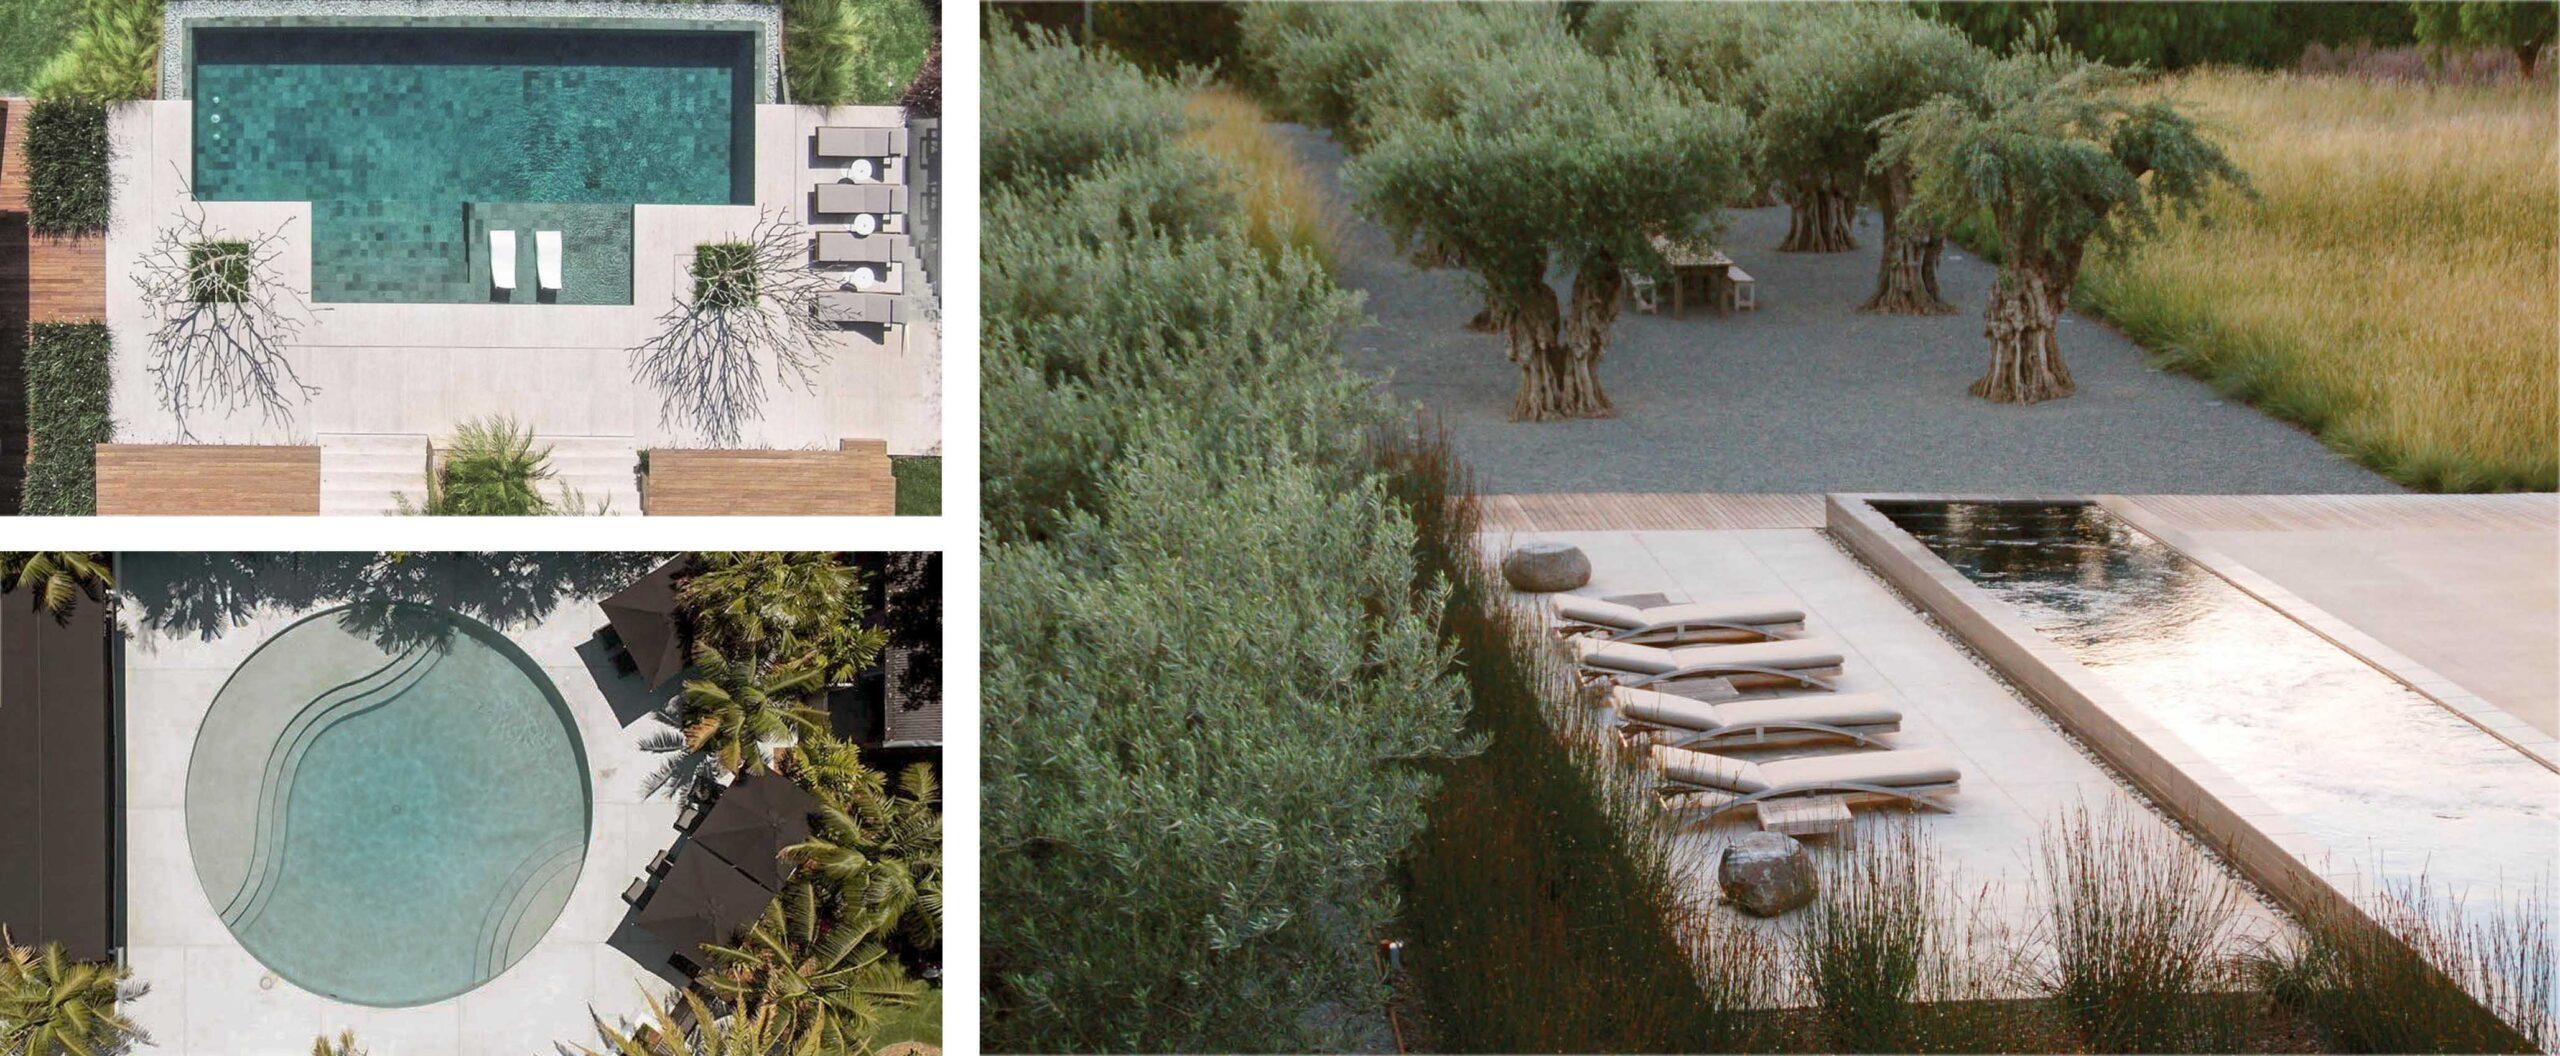 projekt ogrodu z basenem